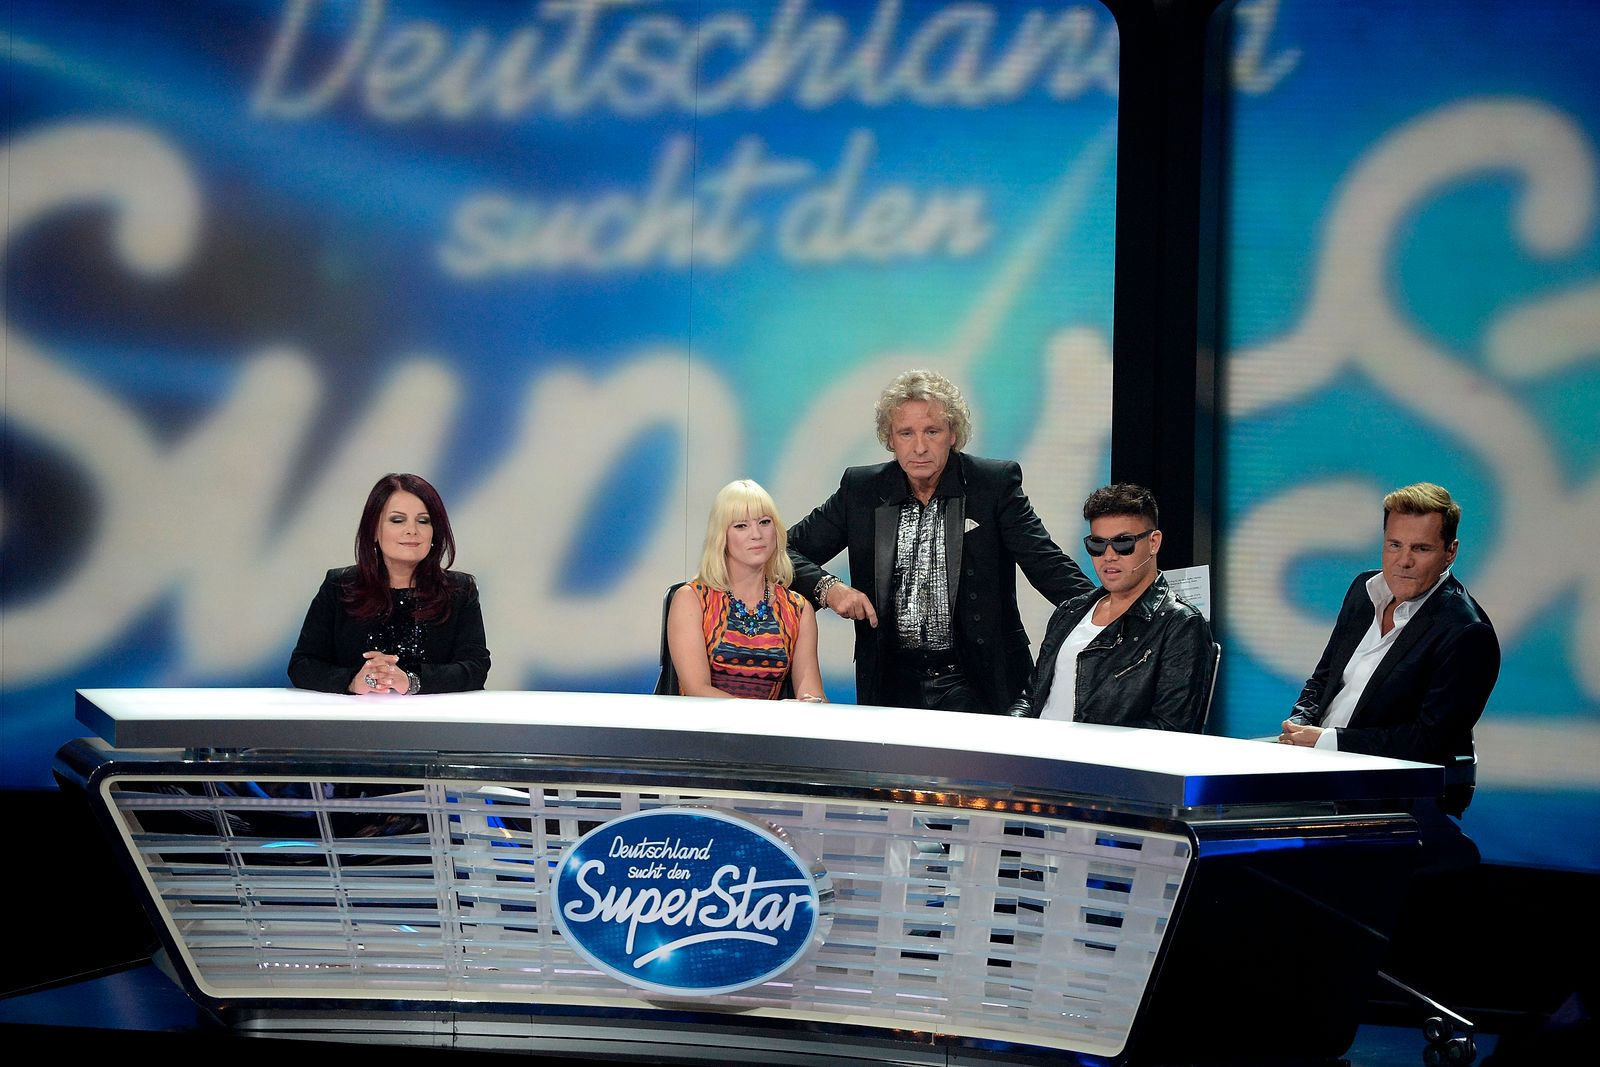 '30 Jahre RTL' Anniversary Show